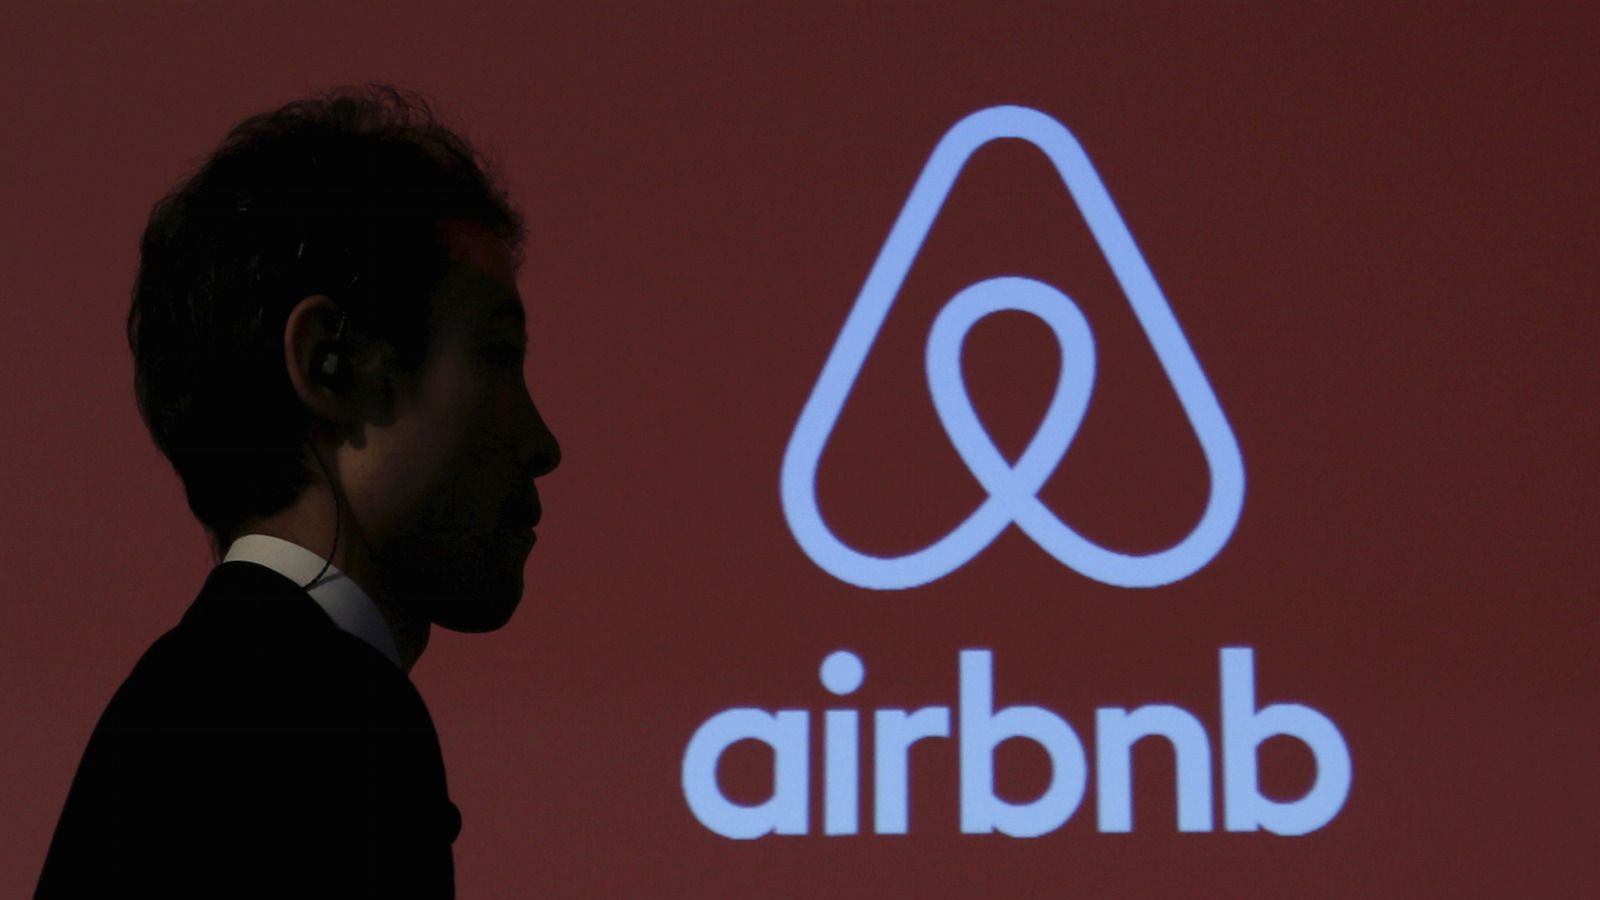 airbnb bitcoins